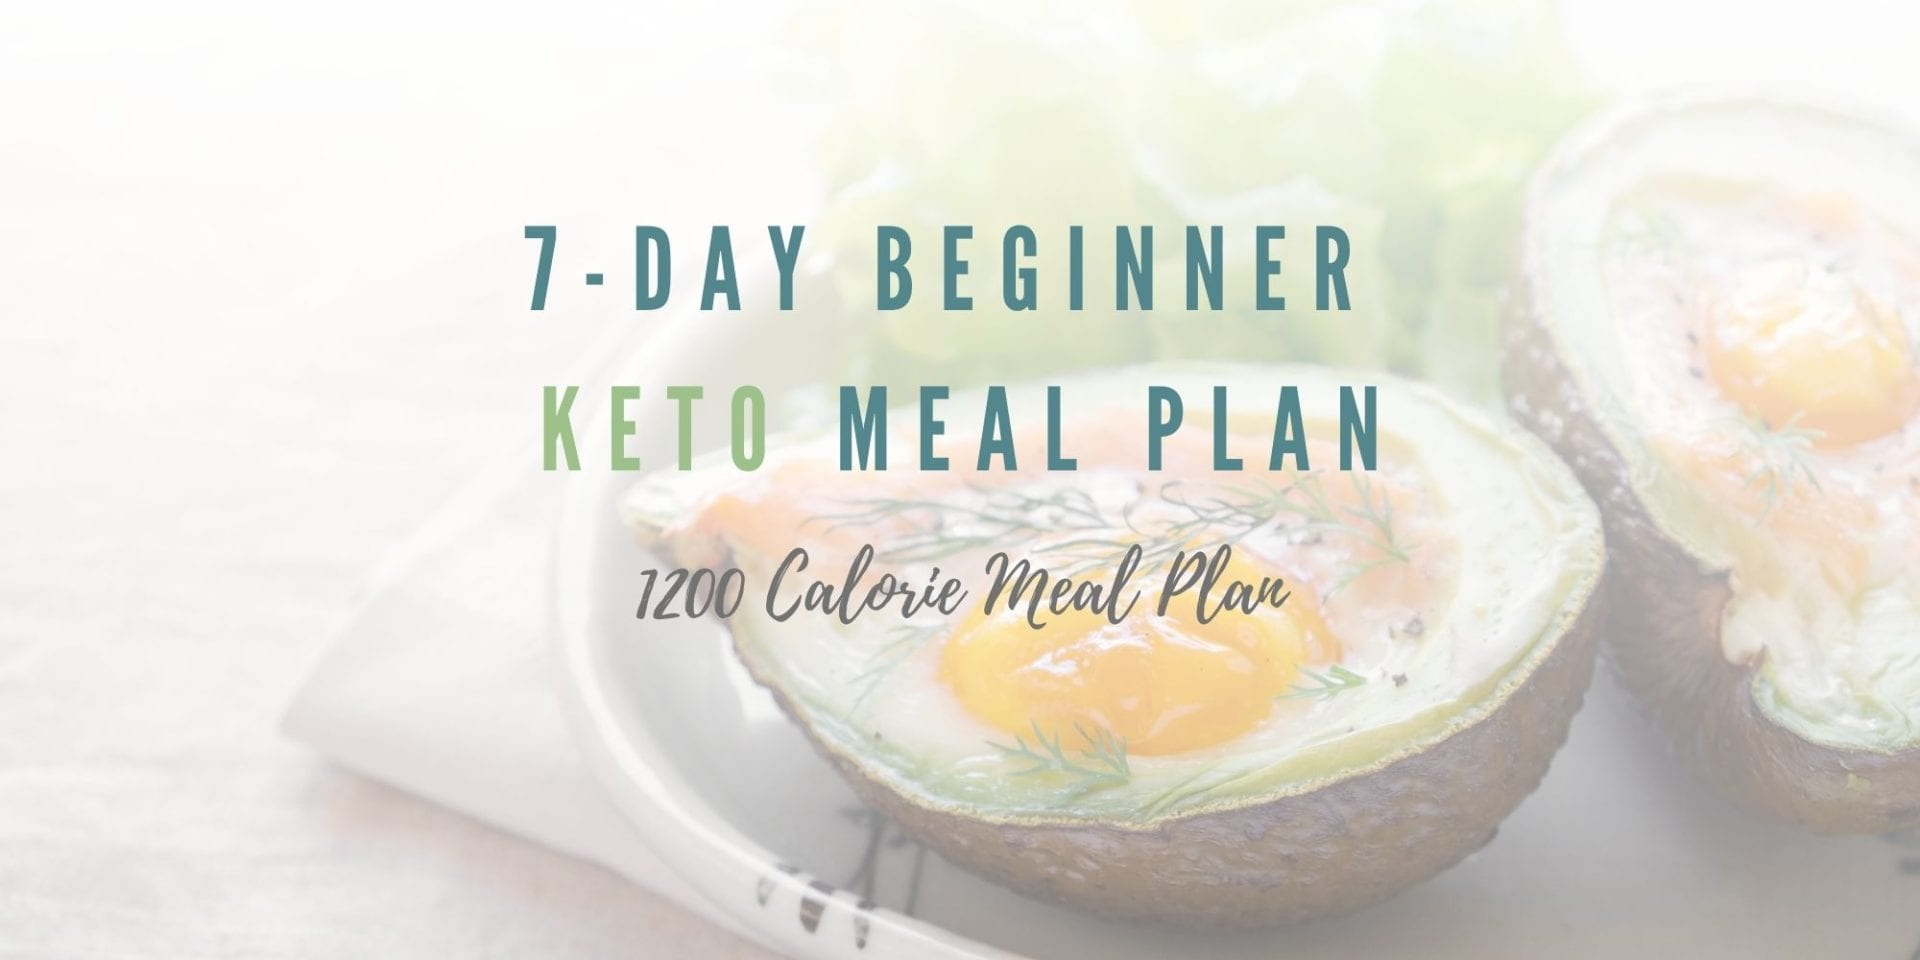 7 Day Beginner - 1,200 Calorie Keto Meal Plan